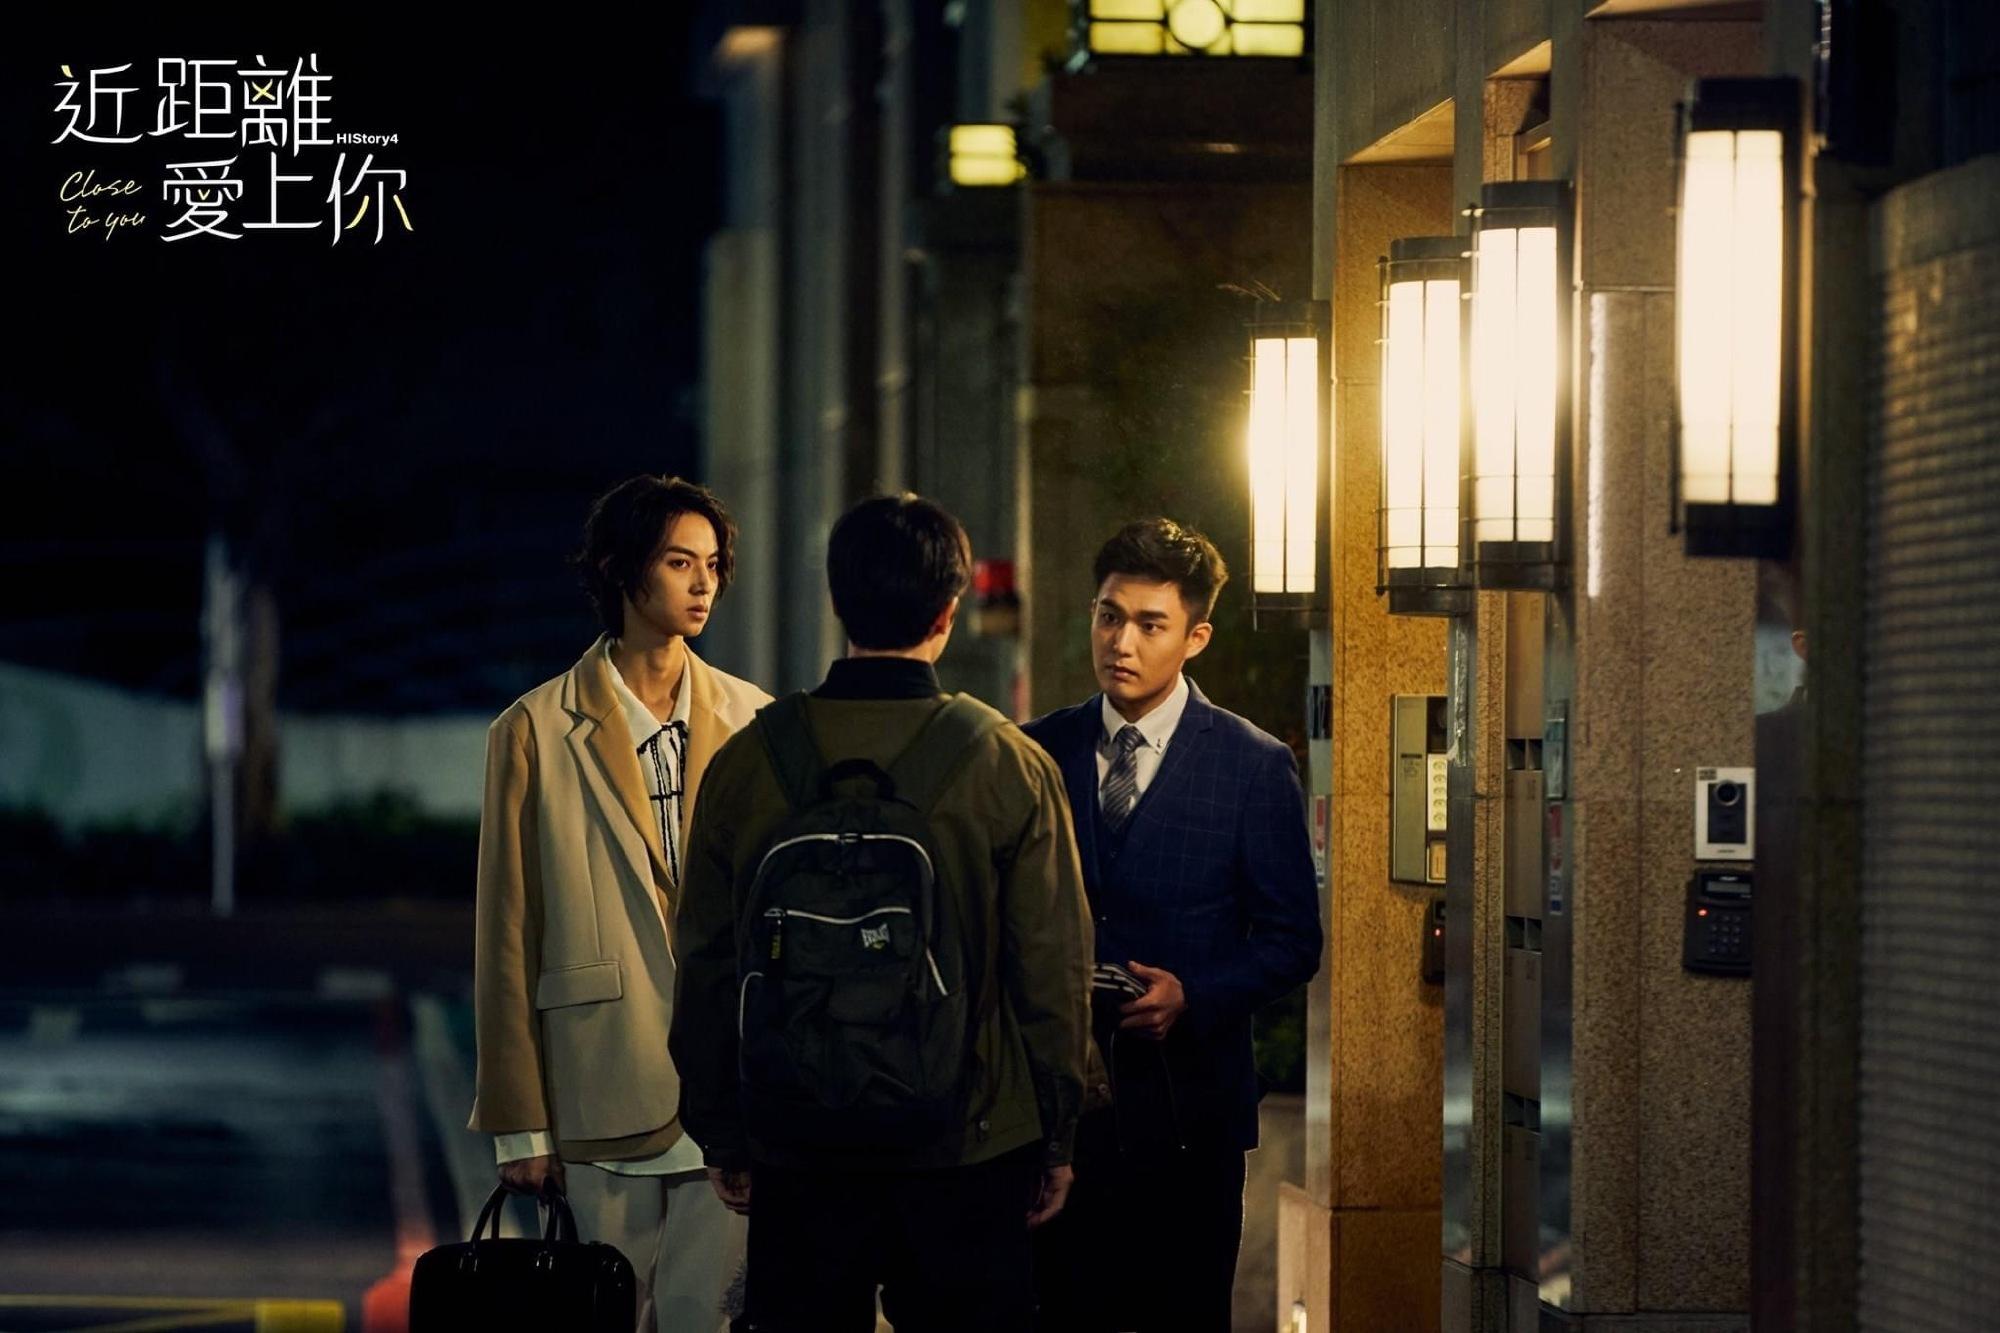 《HIStory4-近距离爱上你》的剧照12